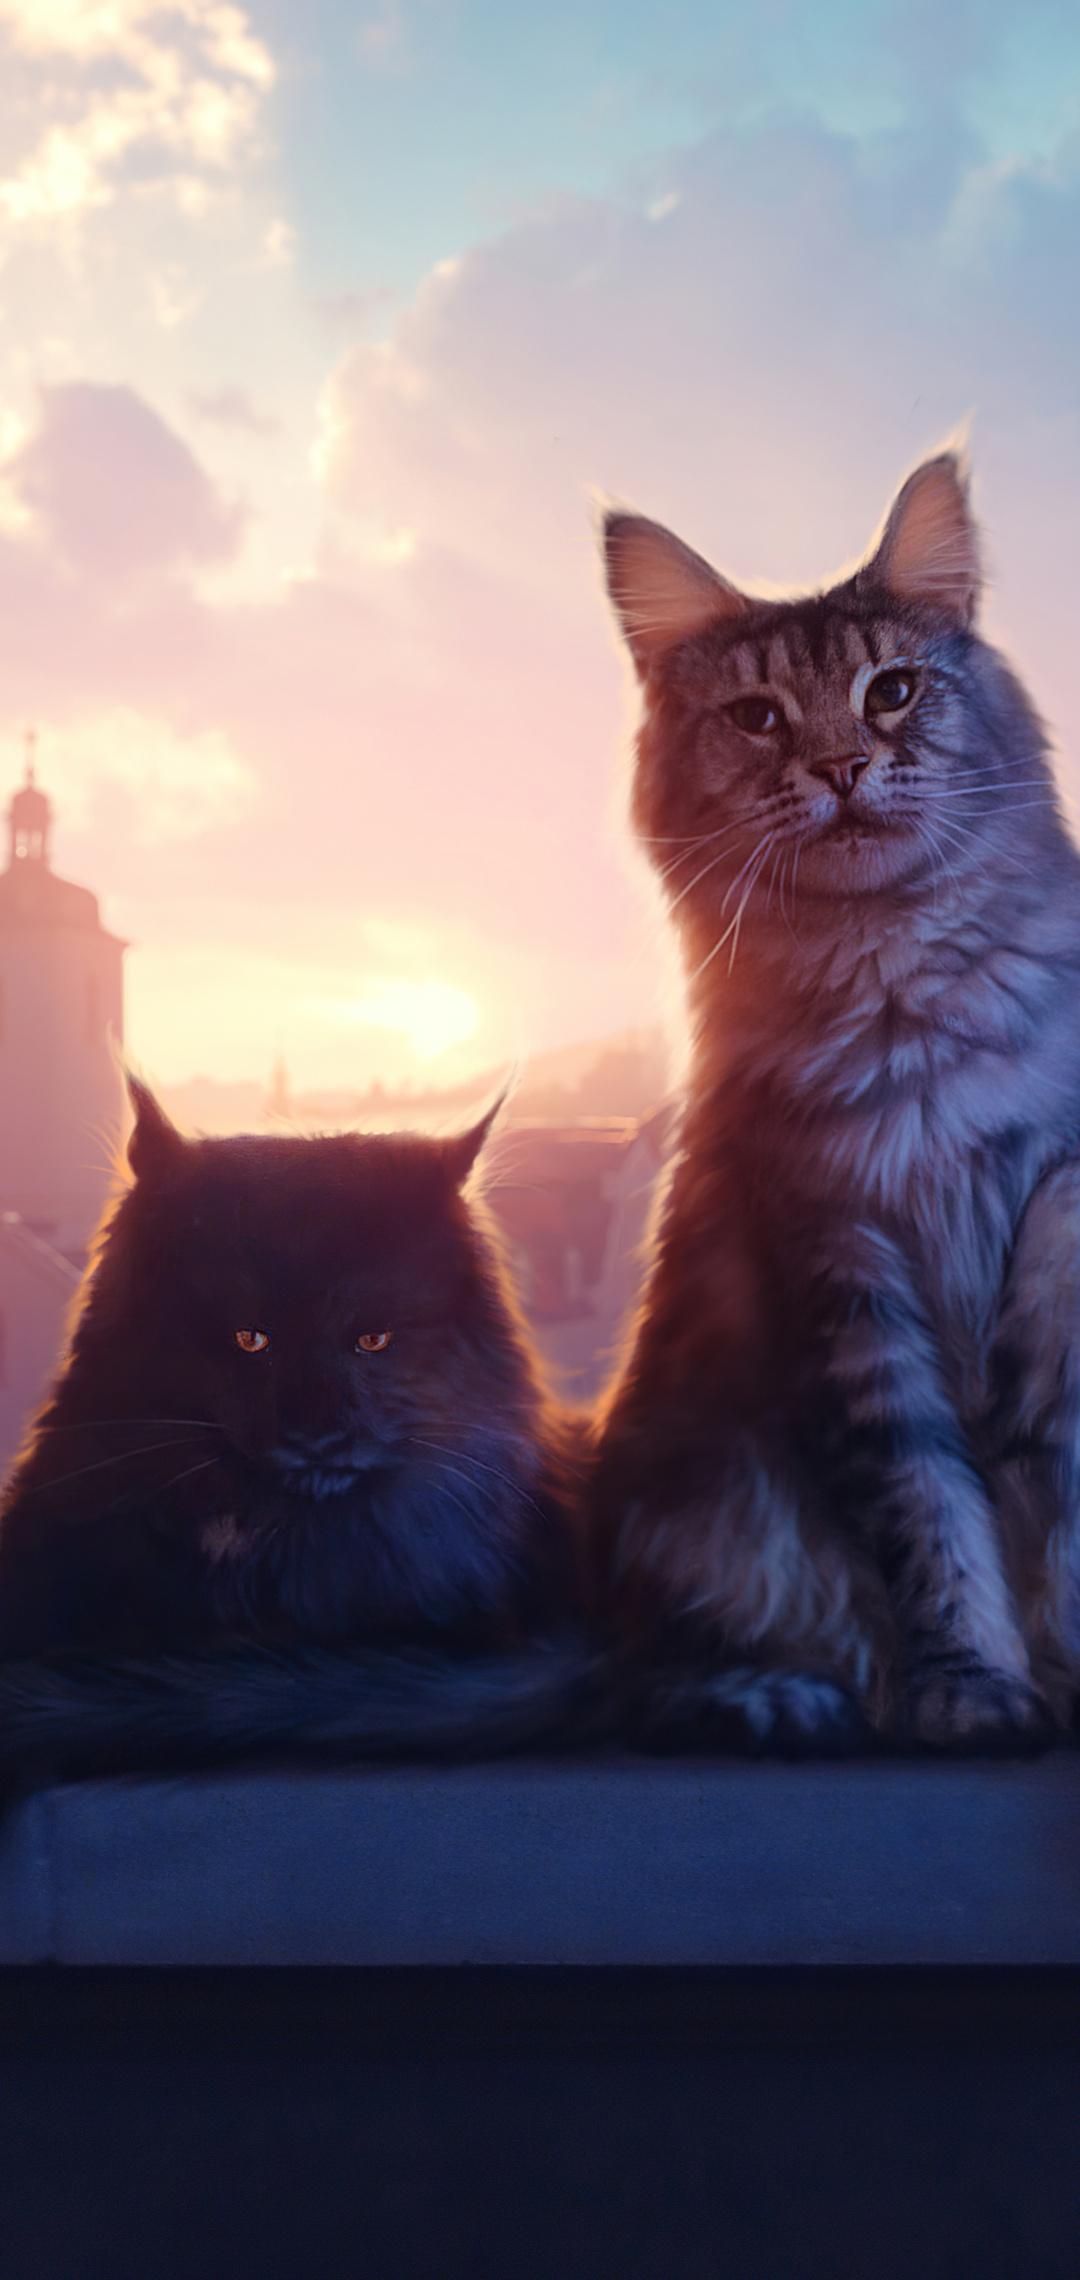 cats-ik.jpg